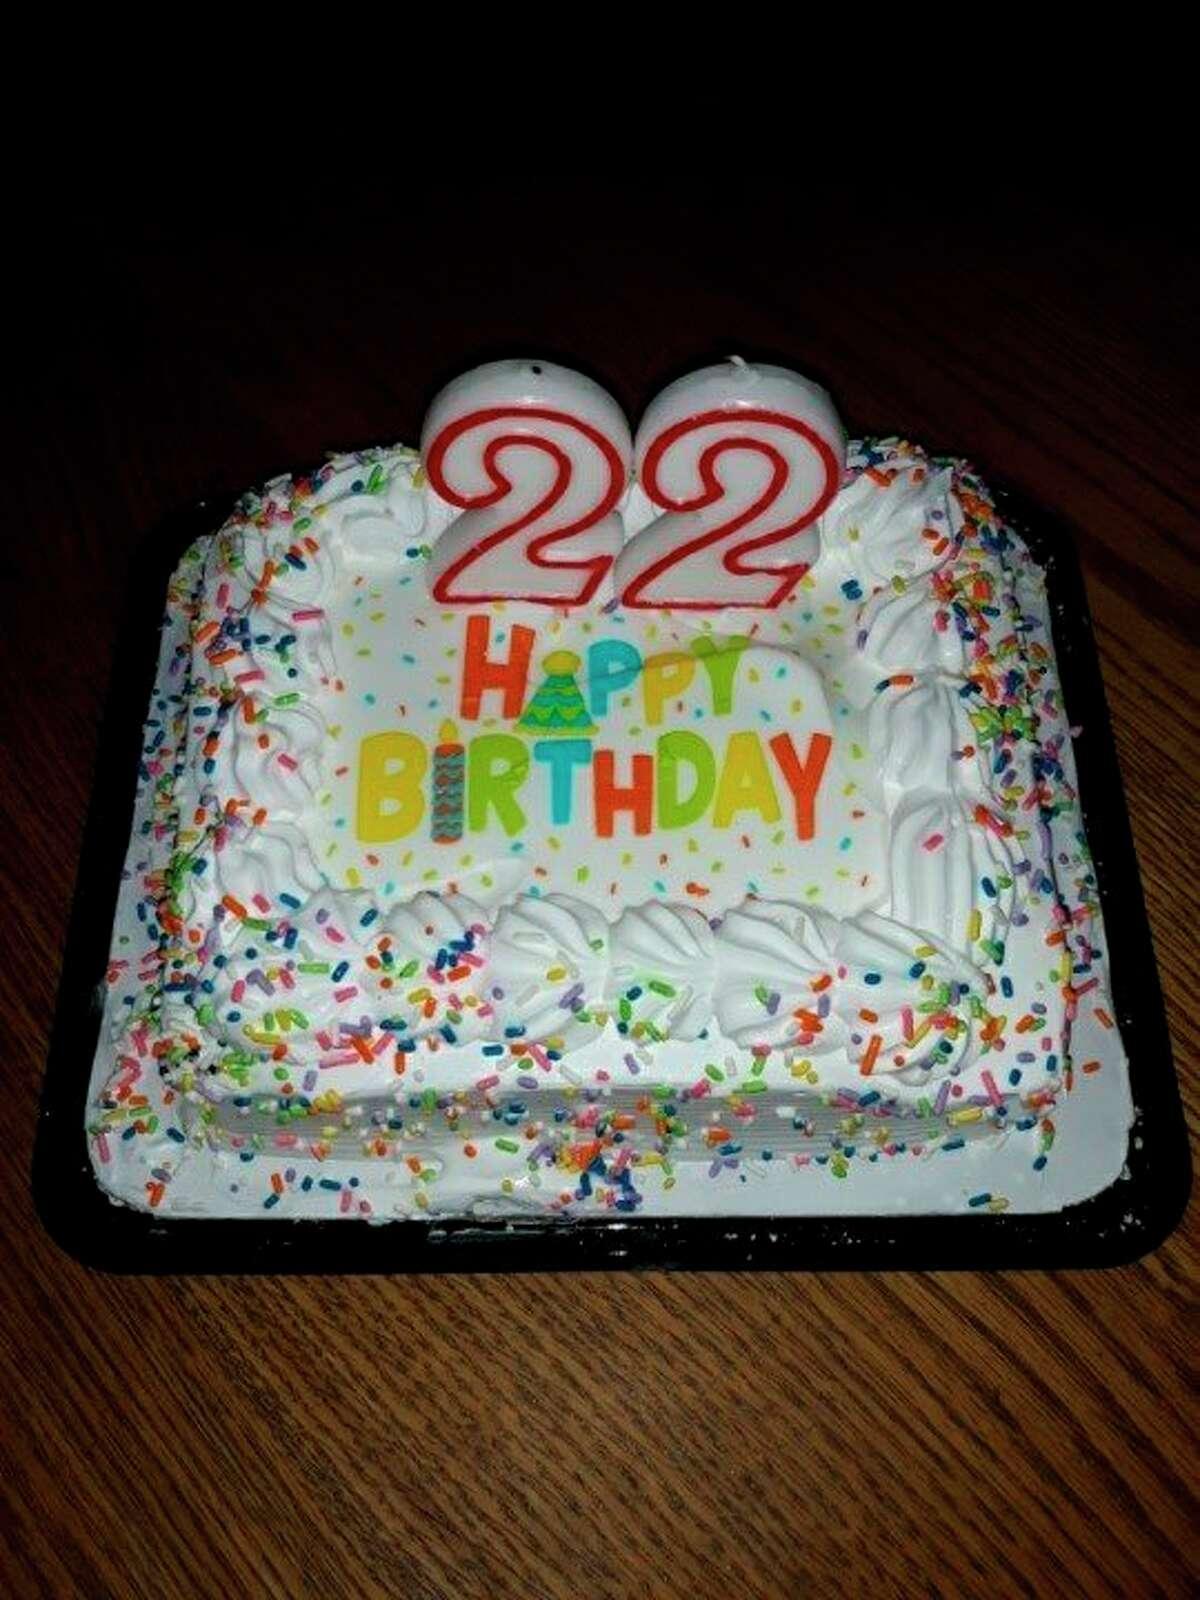 A festive cake to celebrate Lovina's son Benjamin turning 22 on July 14. (Courtesy photo)